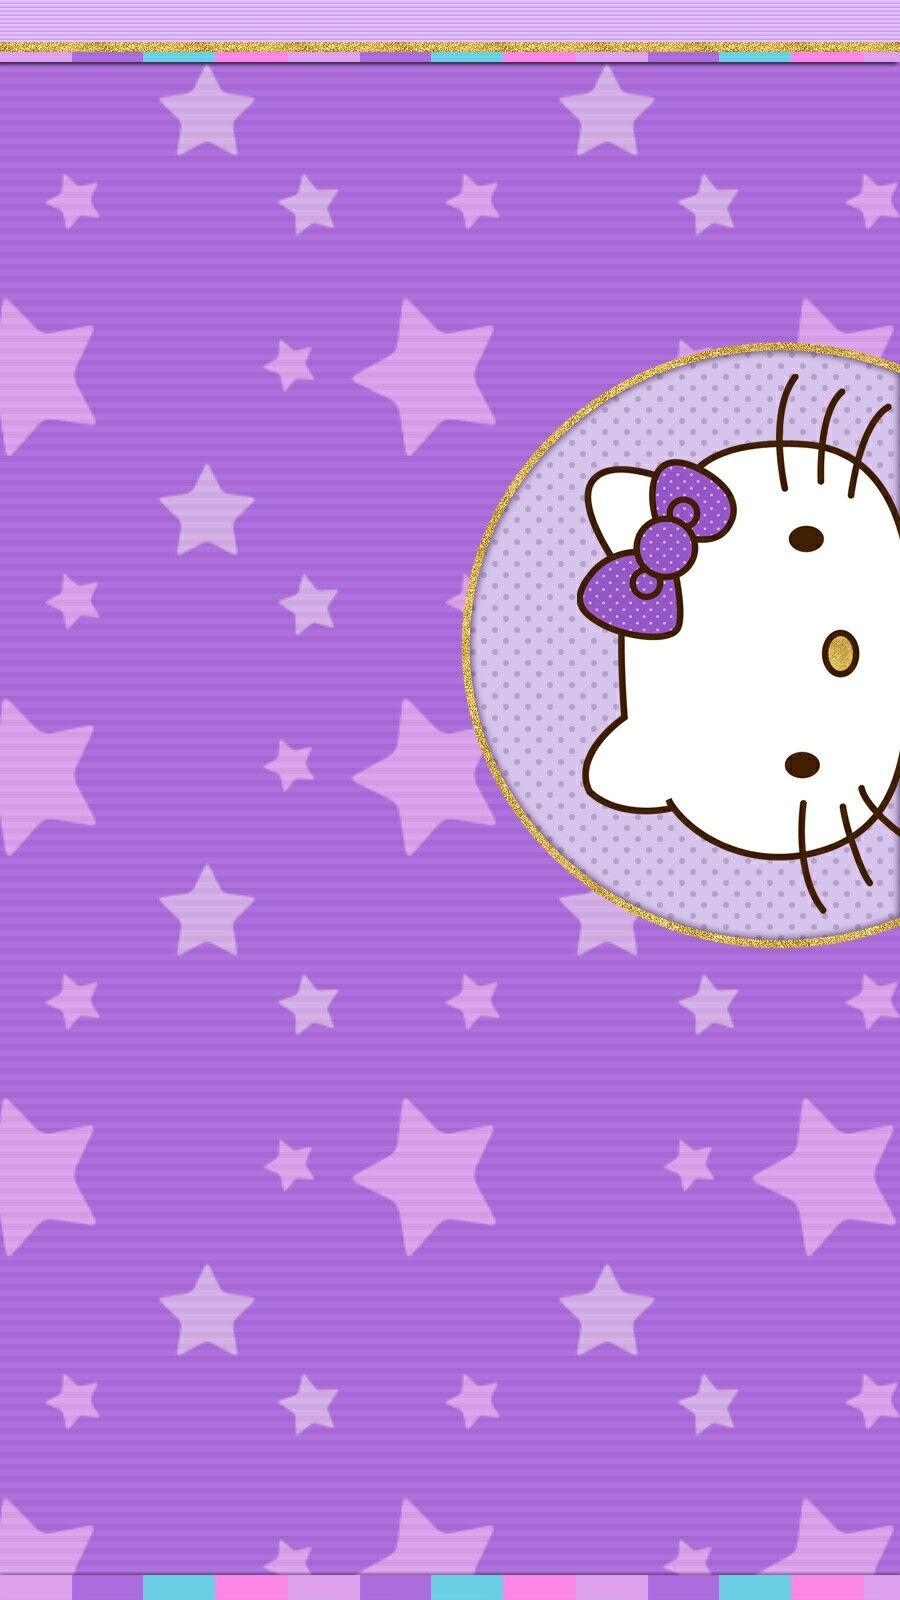 Wonderful Wallpaper Hello Kitty Purple - b44cc114ad304656898c95f1d6341fcc  Gallery_46484.jpg